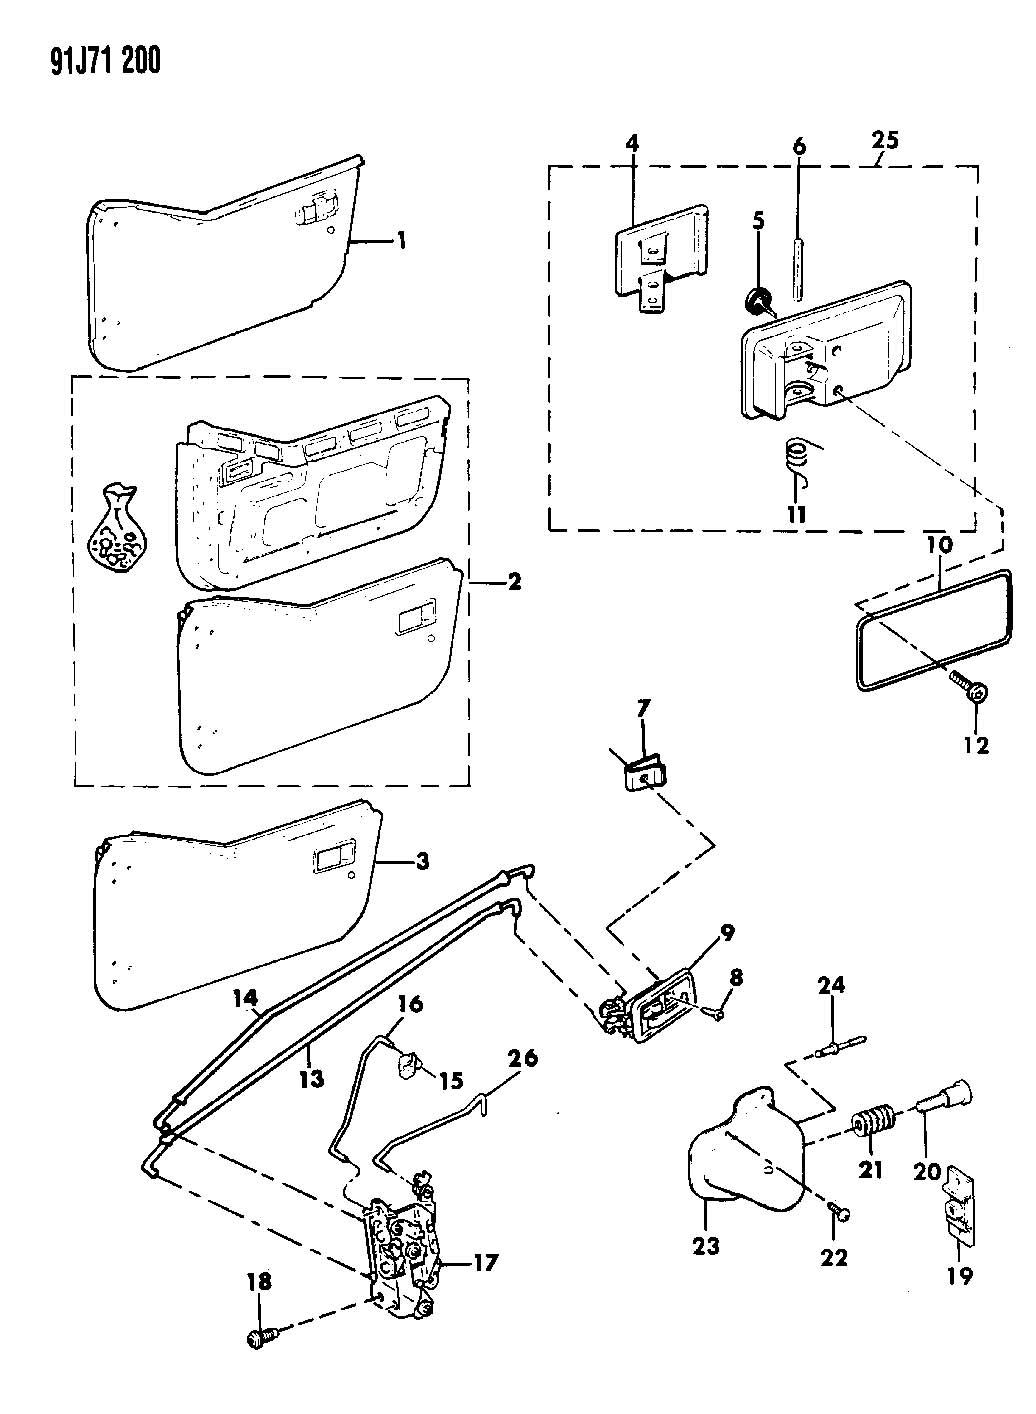 1990 Jeep Clip. Handle to latch rod. Trim: (*o0.). Cgt